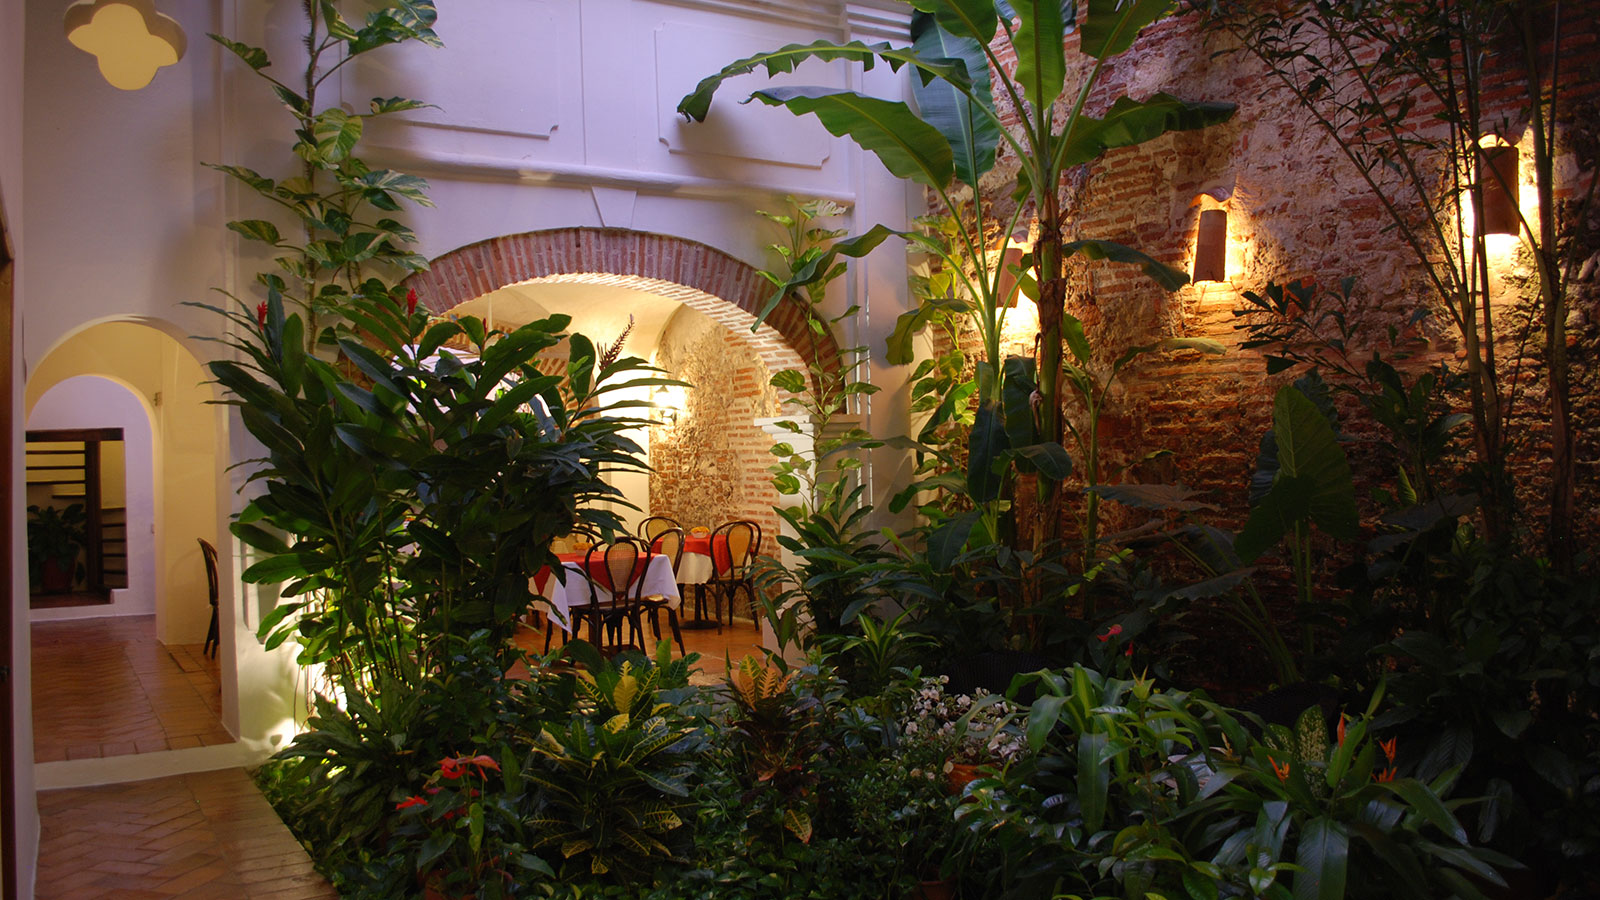 Image of garden patio restaurant at Alfiz Hotel, 1700, Member of Historic Hotels Worldwide, in Cartagena de Indias, Colombia, Taste